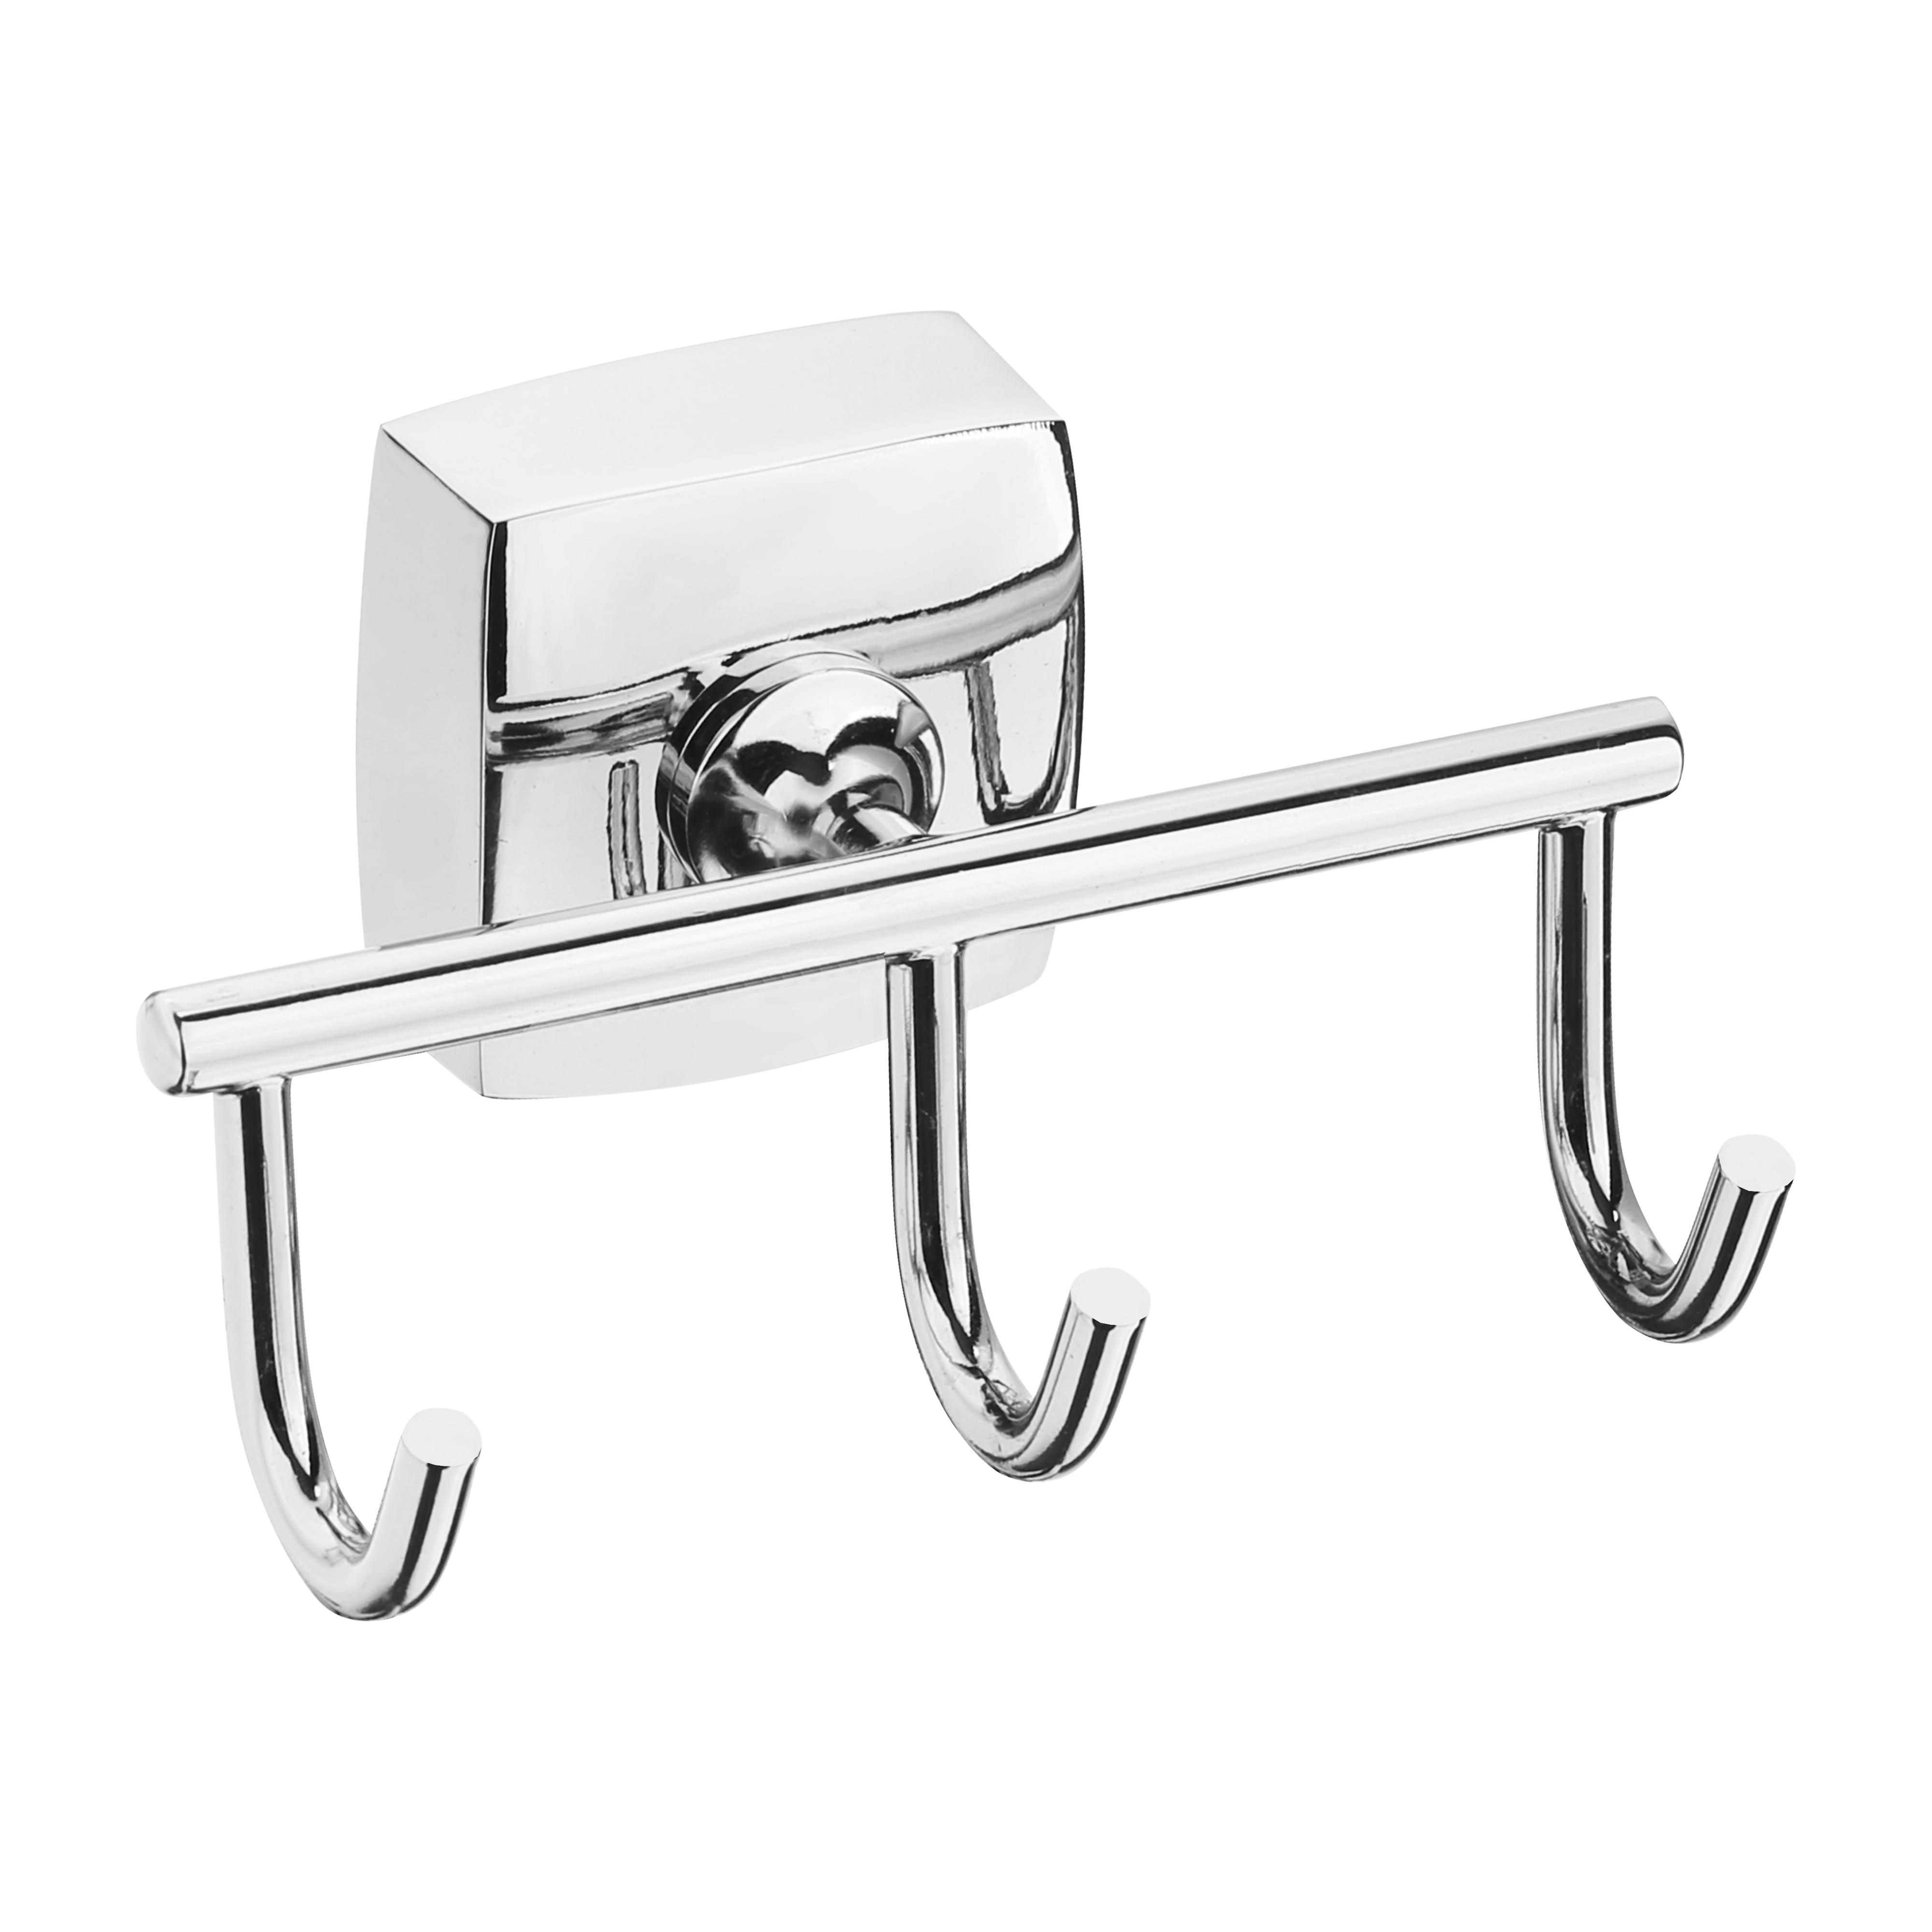 Крючок для полотенец в ванную Fora K052